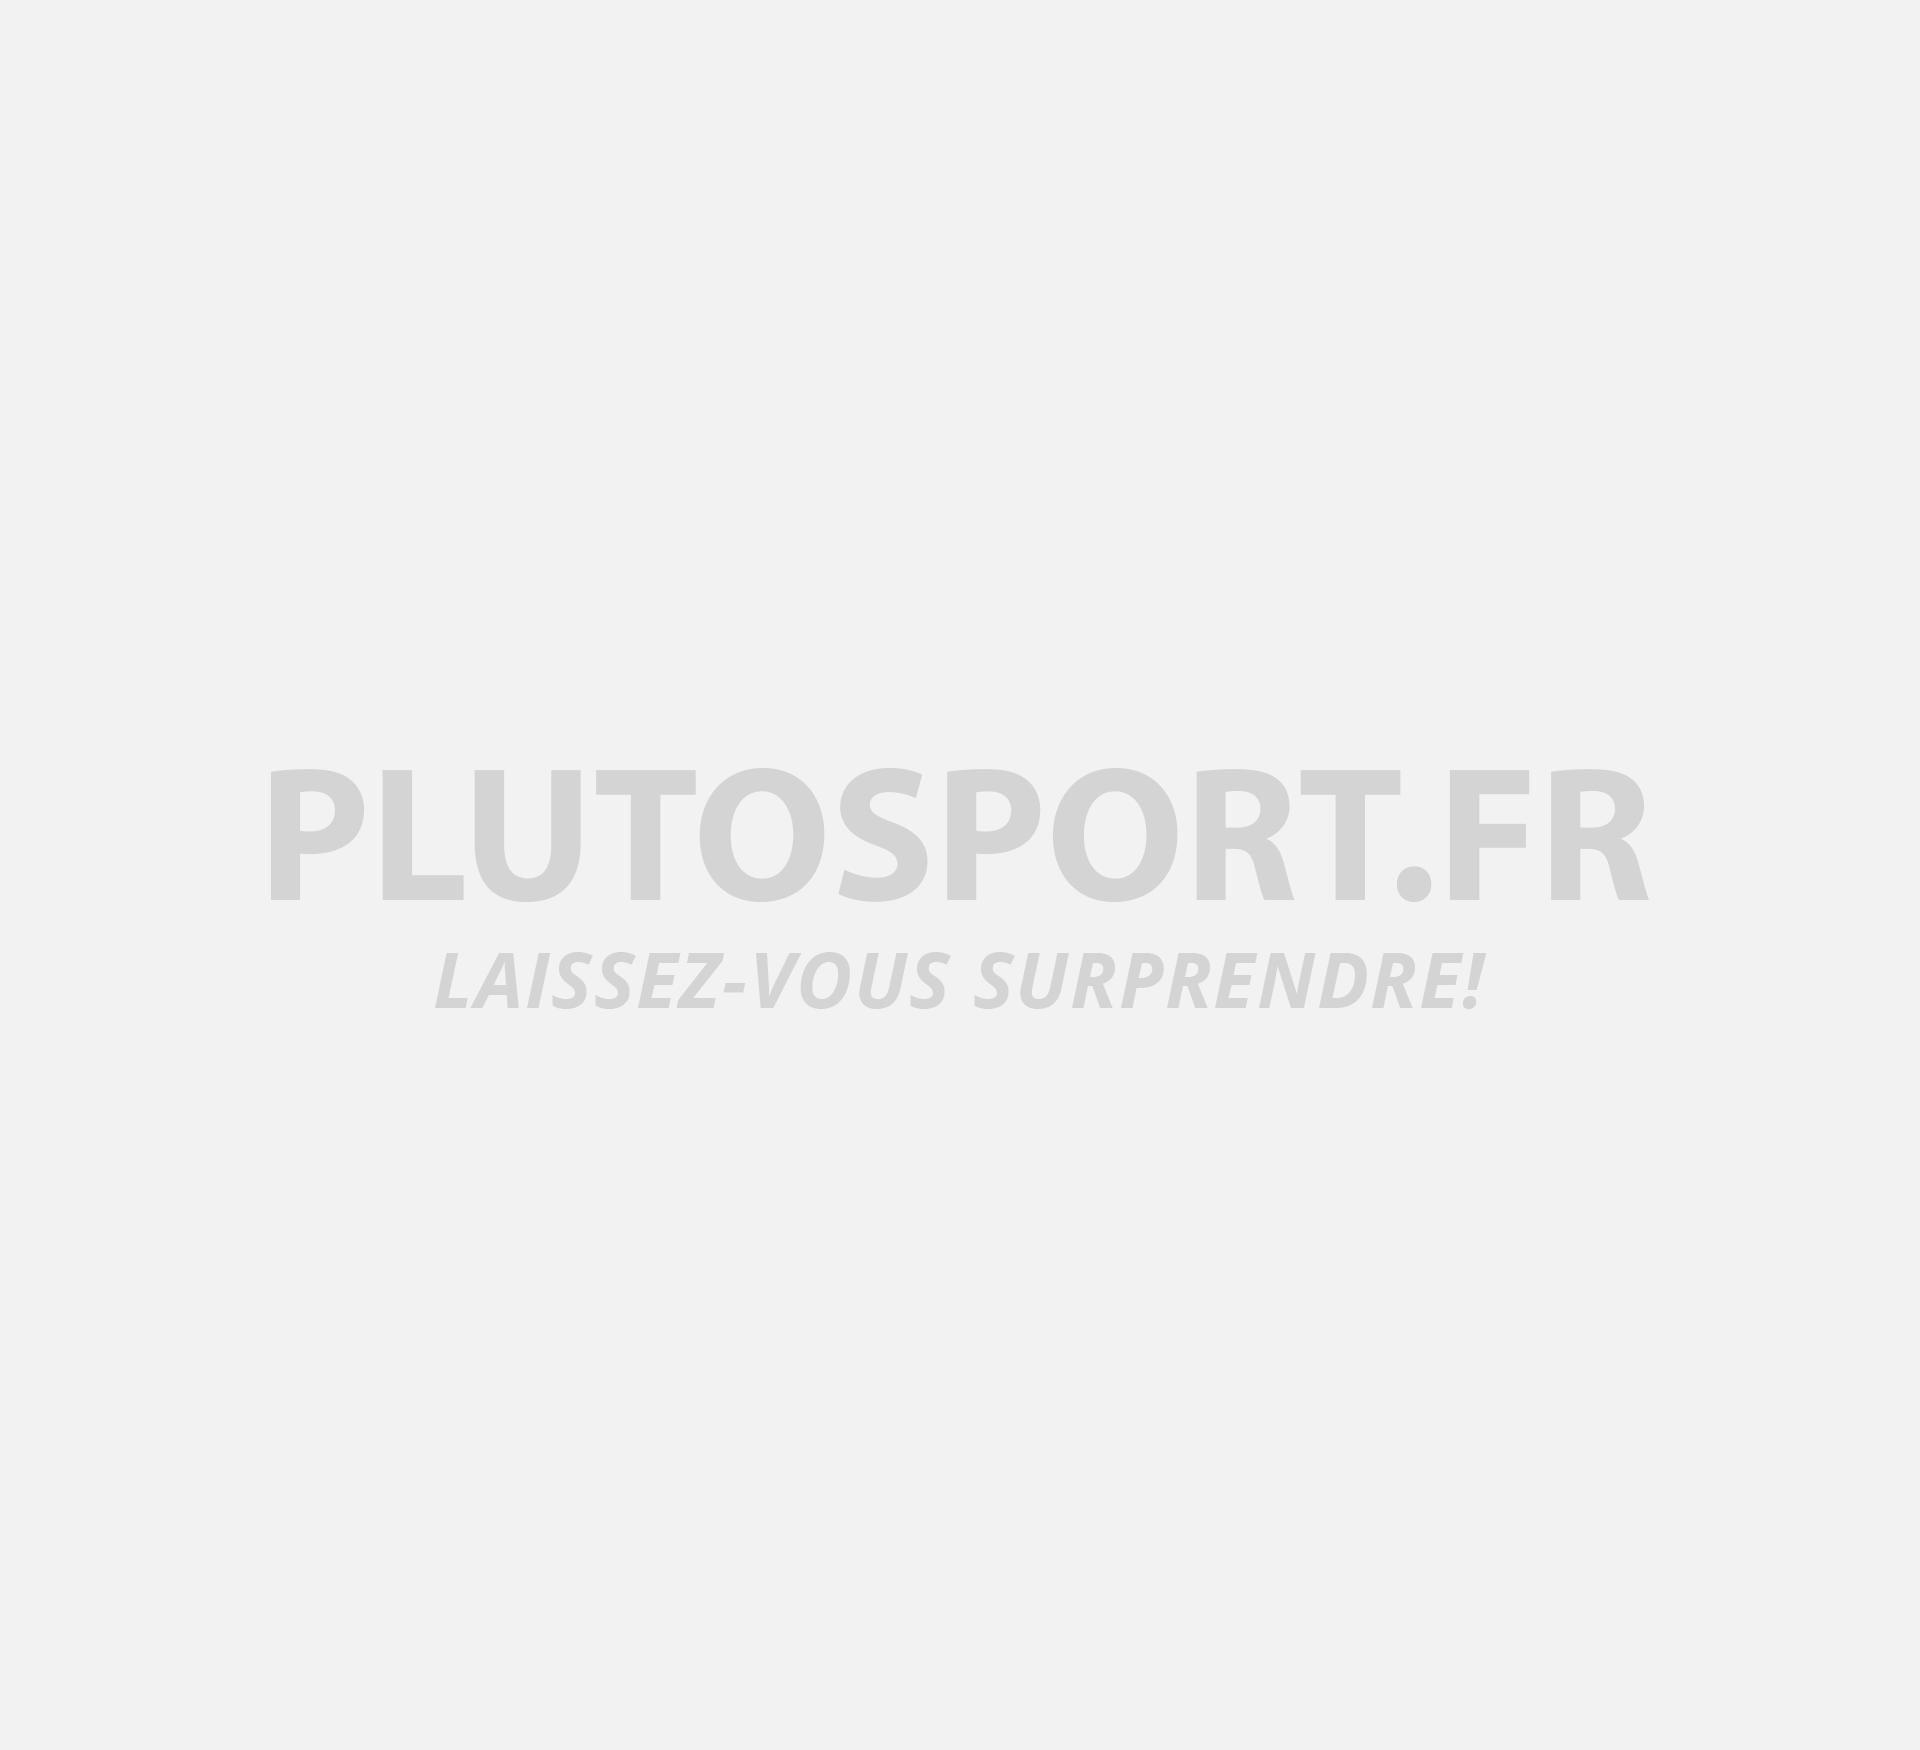 Thaïlande Discount IL060 2019 Adidas Chaussure NMD Runner 2